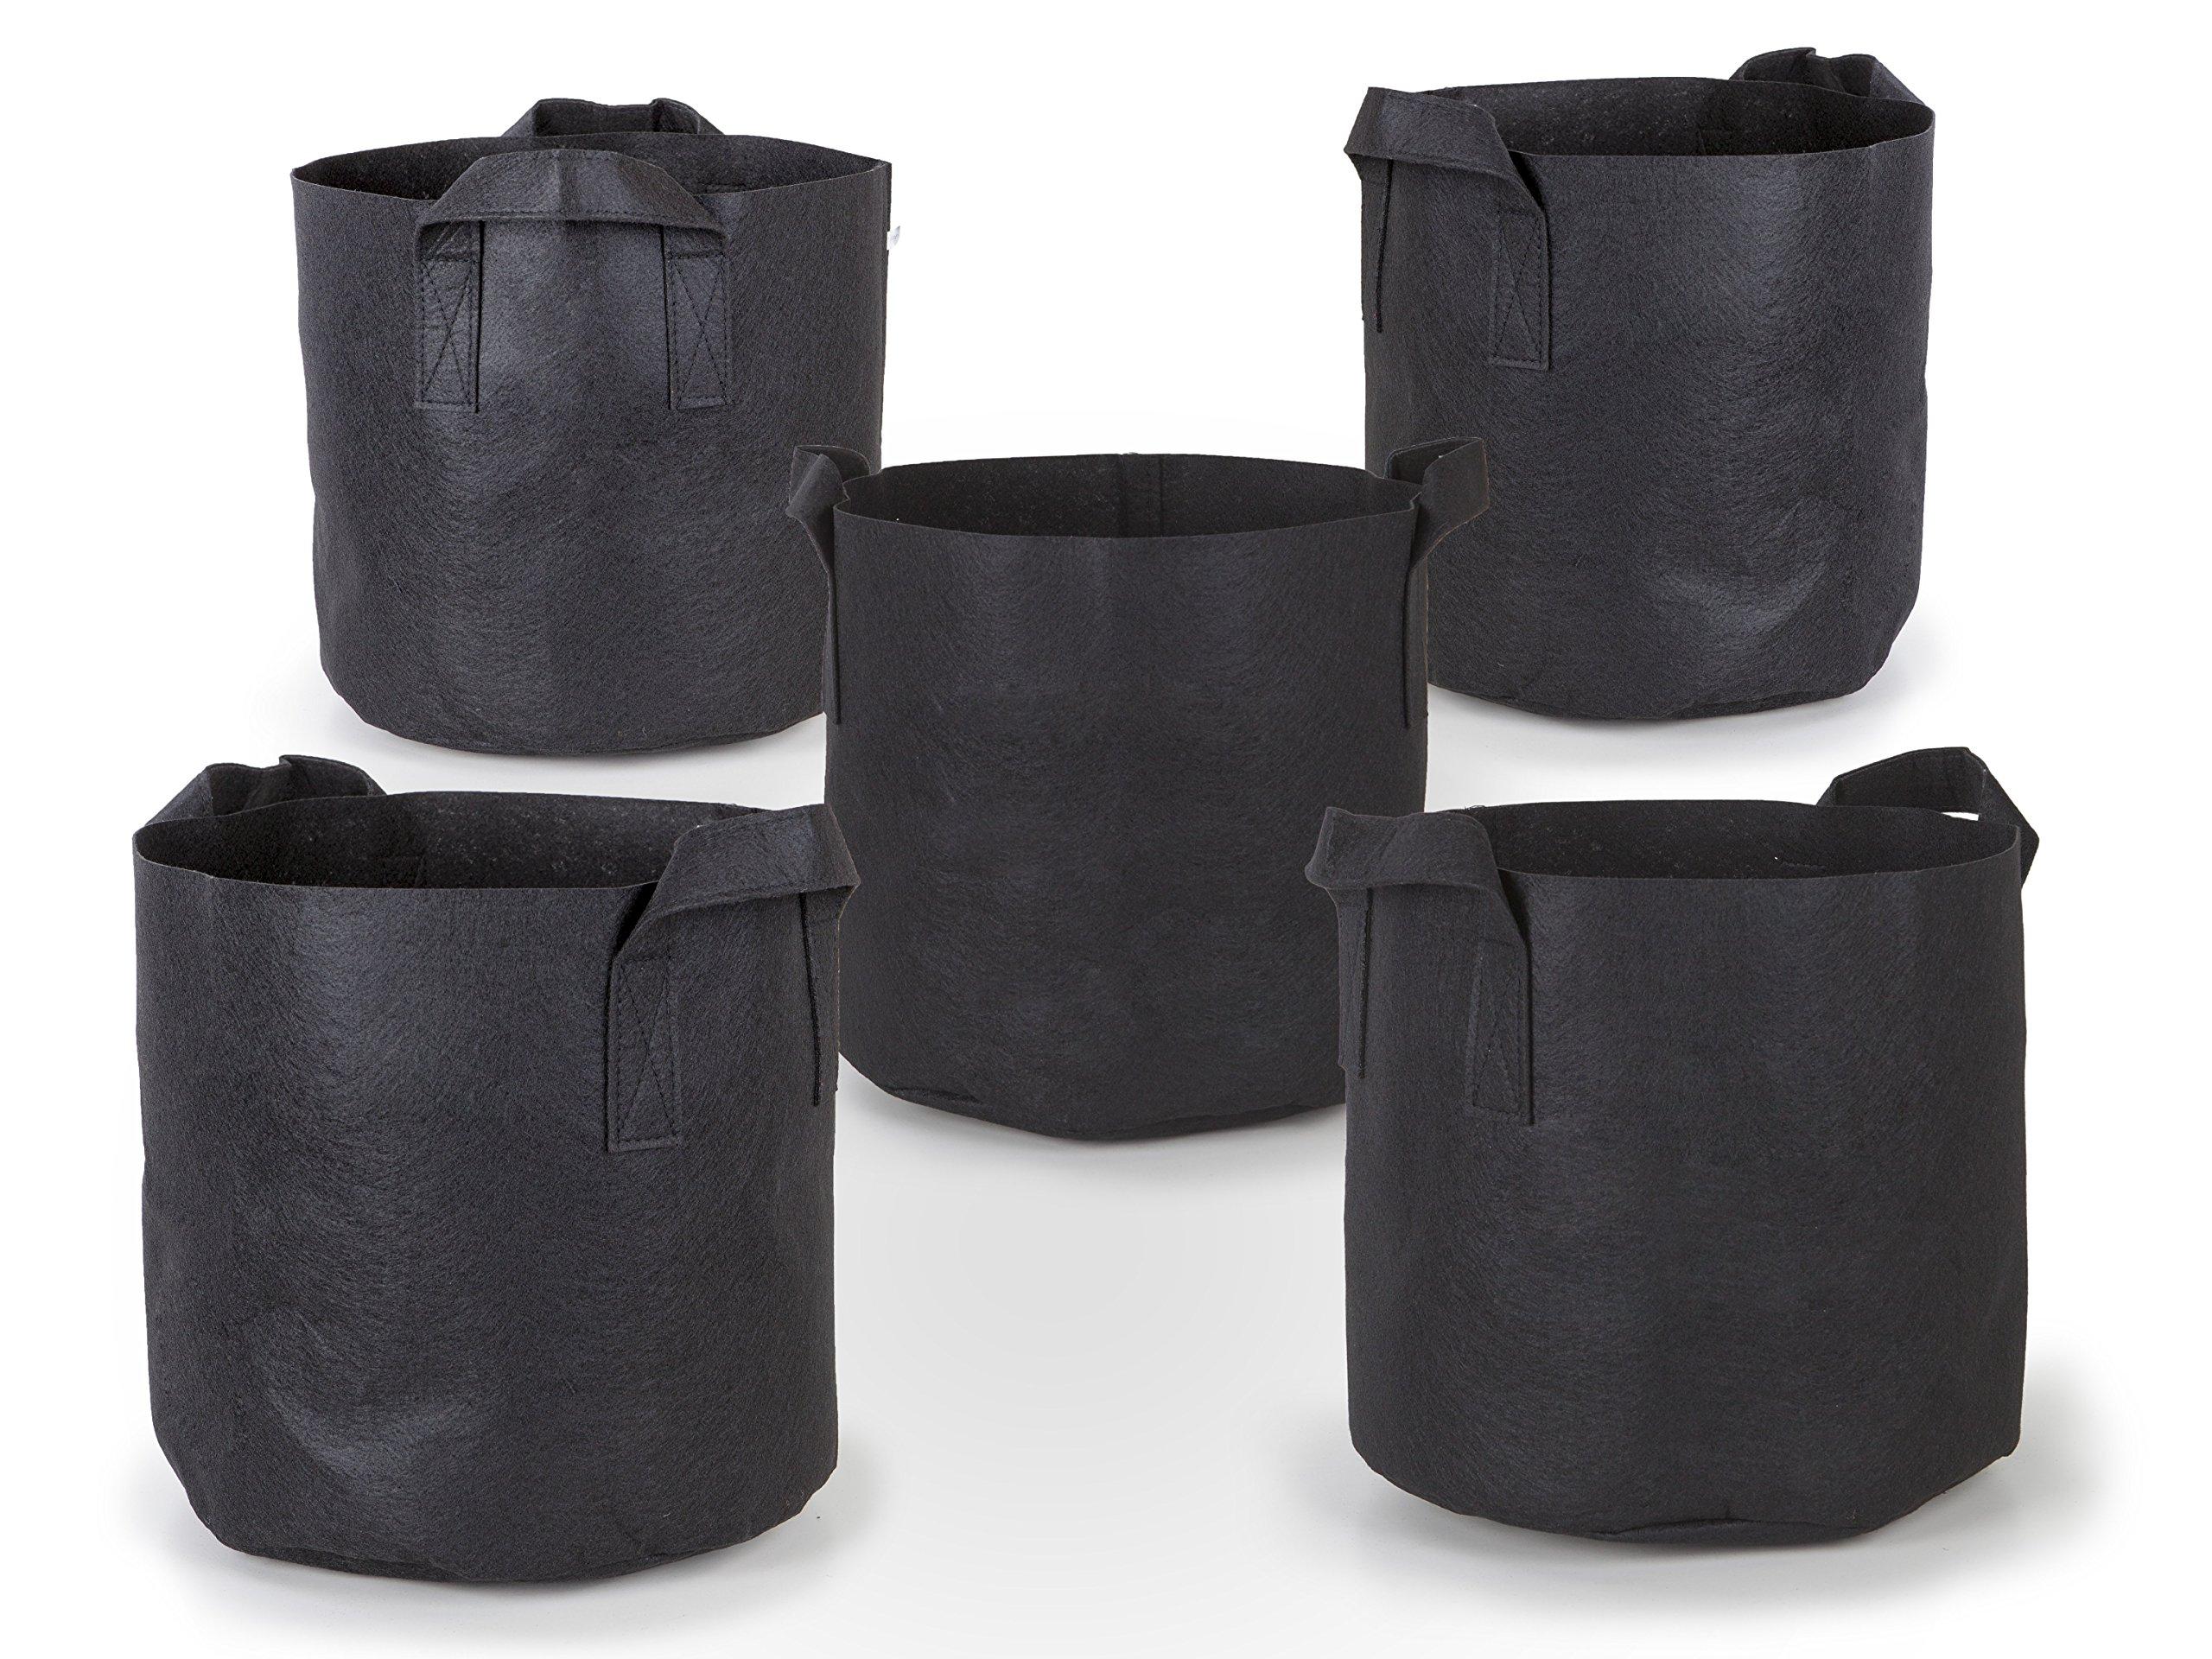 247Garden 5-Pack 10 Gallon Grow Bags/Aeration Fabric Pots w/Handles (Black)